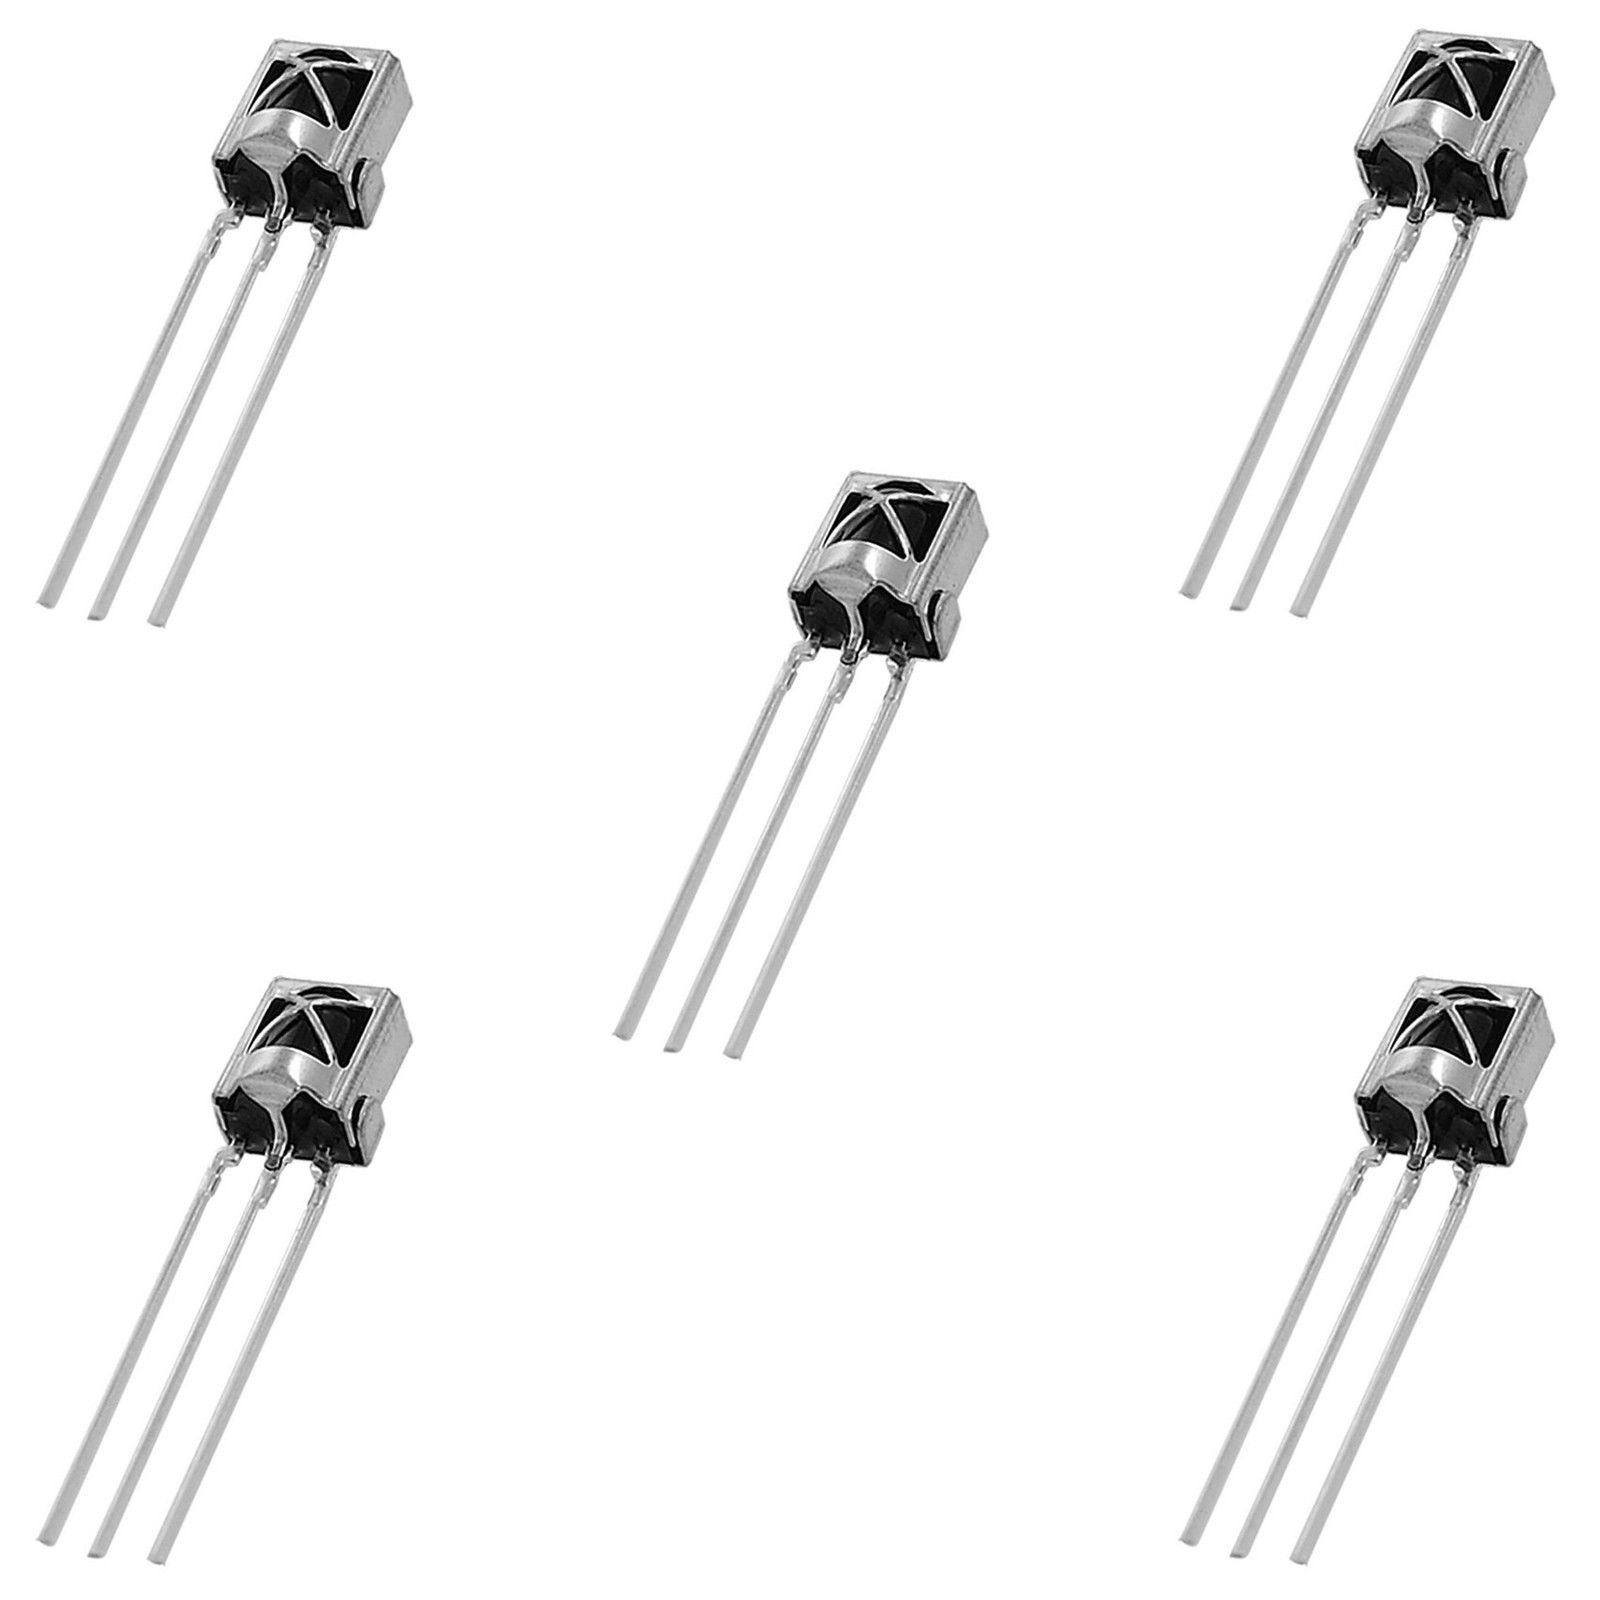 5 x v1838b tl1838 38khz universal ir infrared receiver